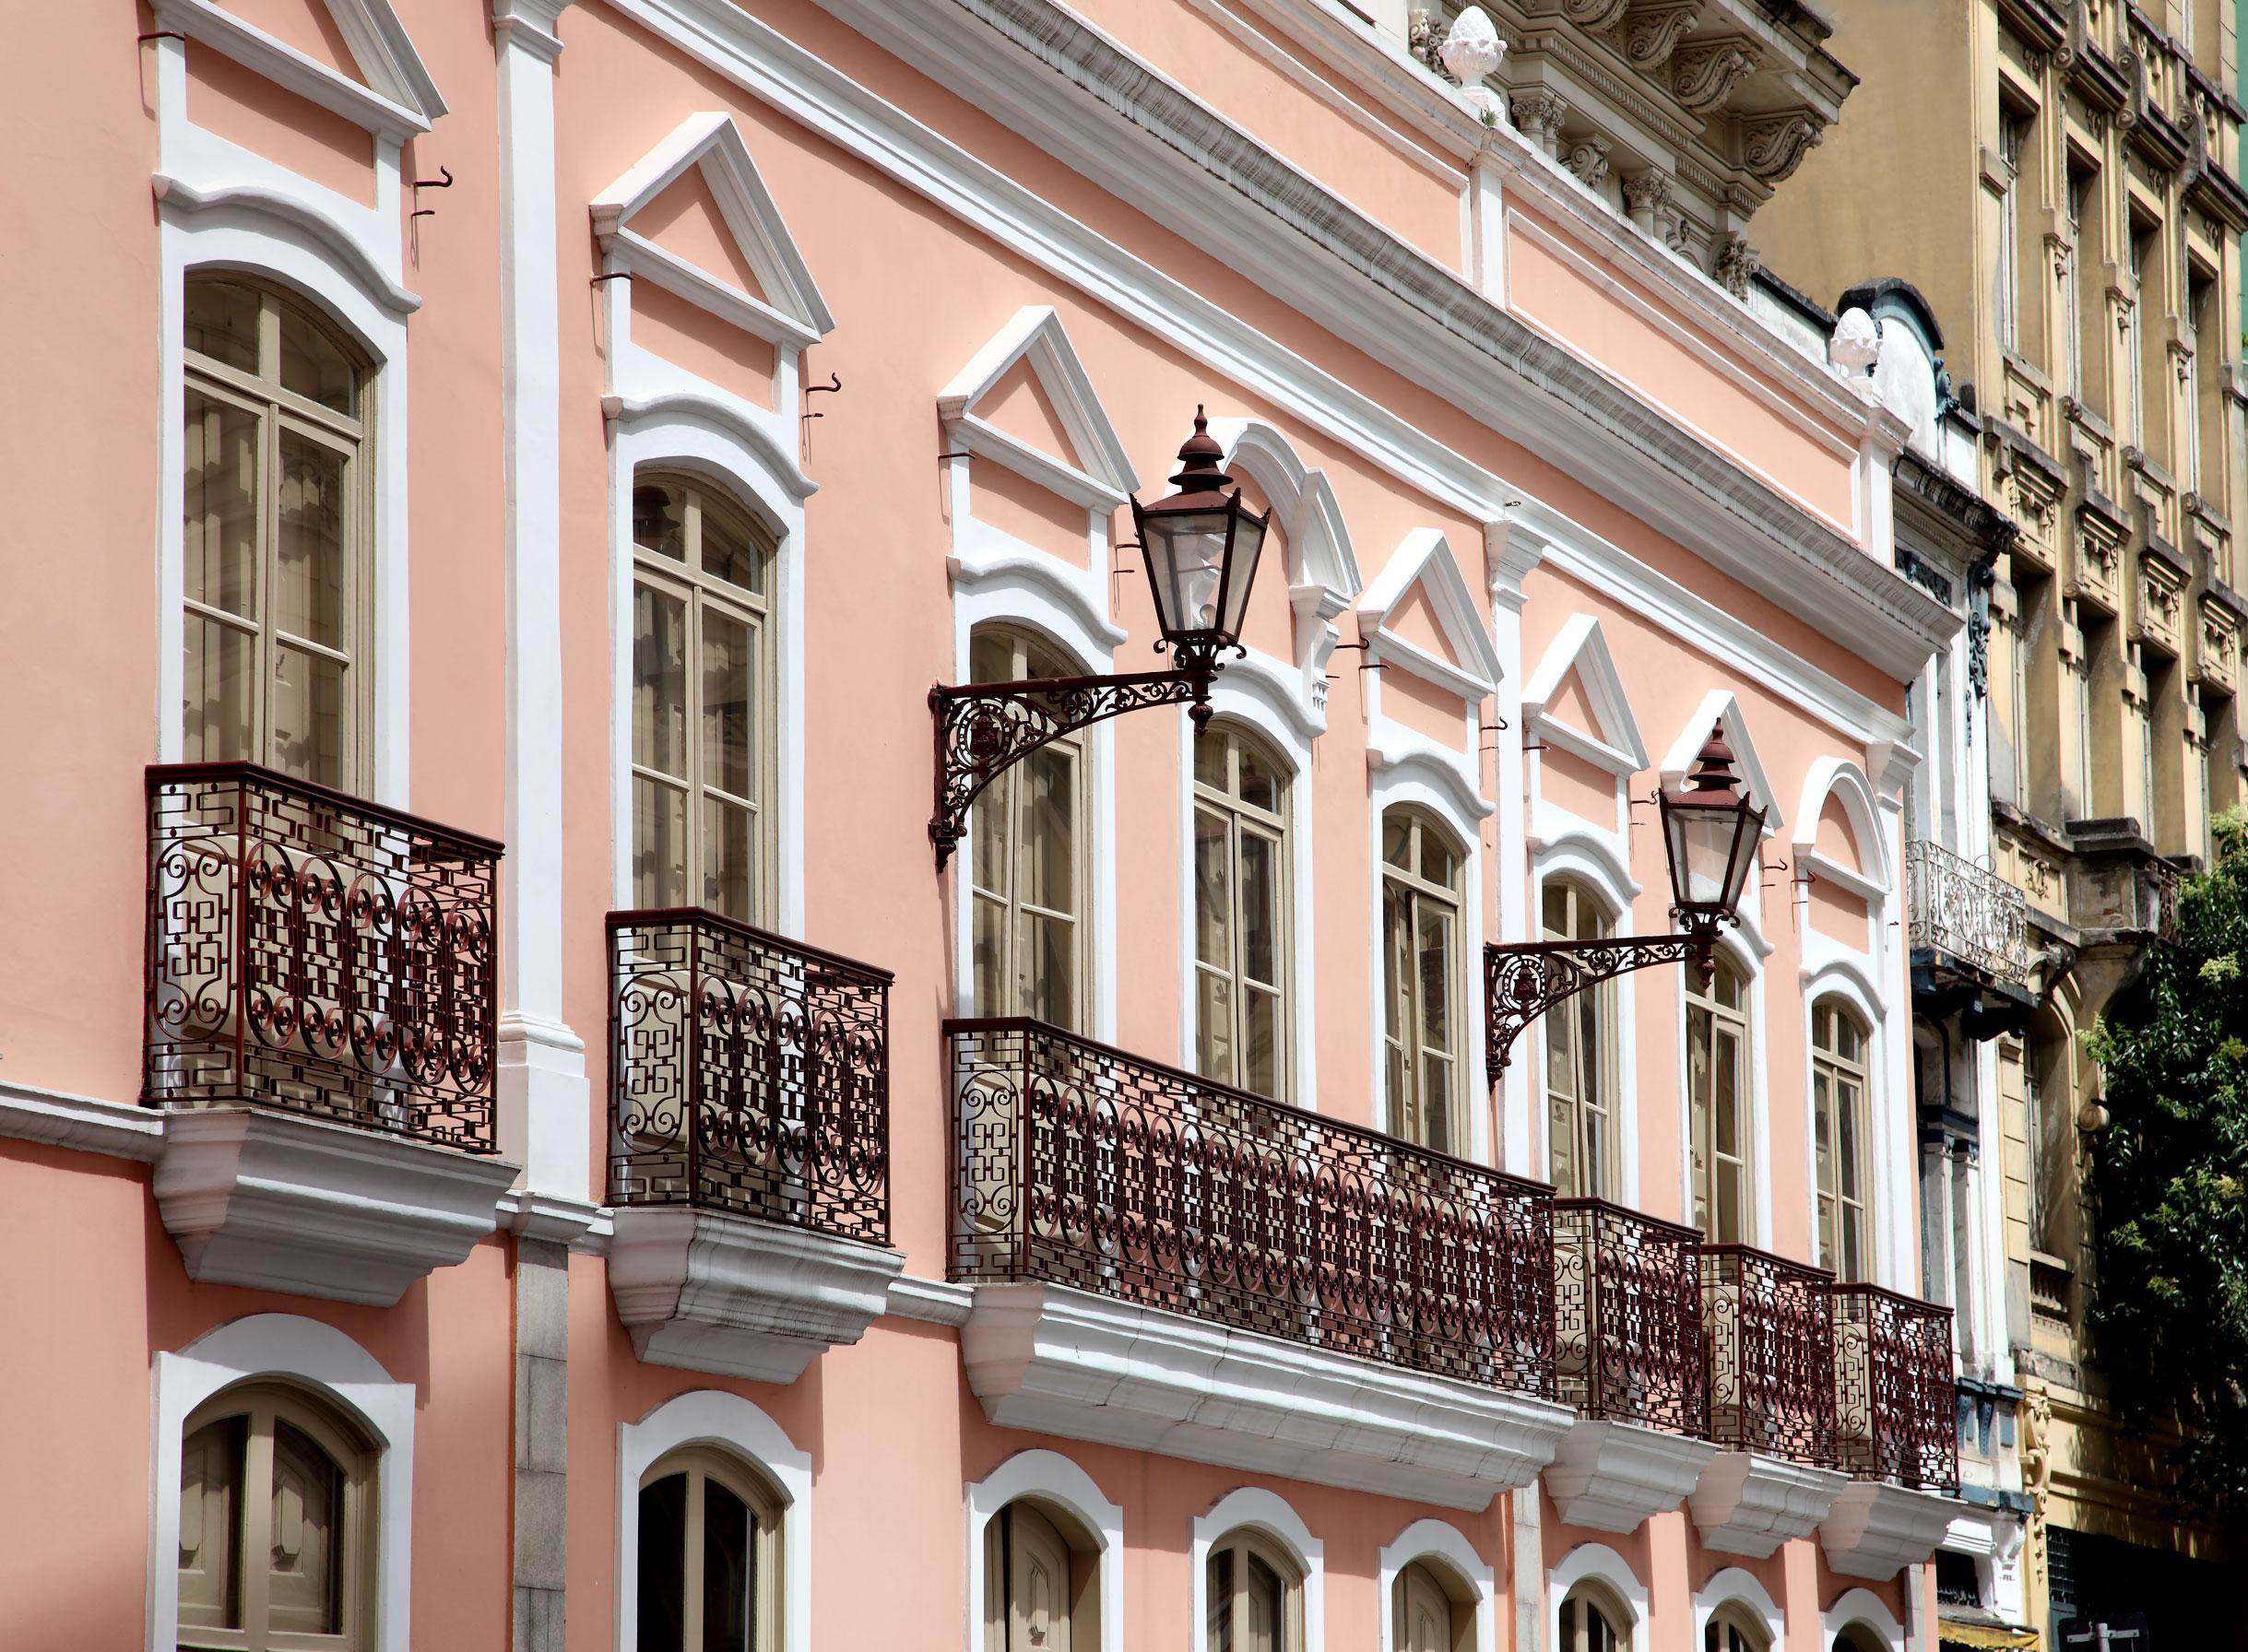 fachada solar da marquesa passeio cultural sp